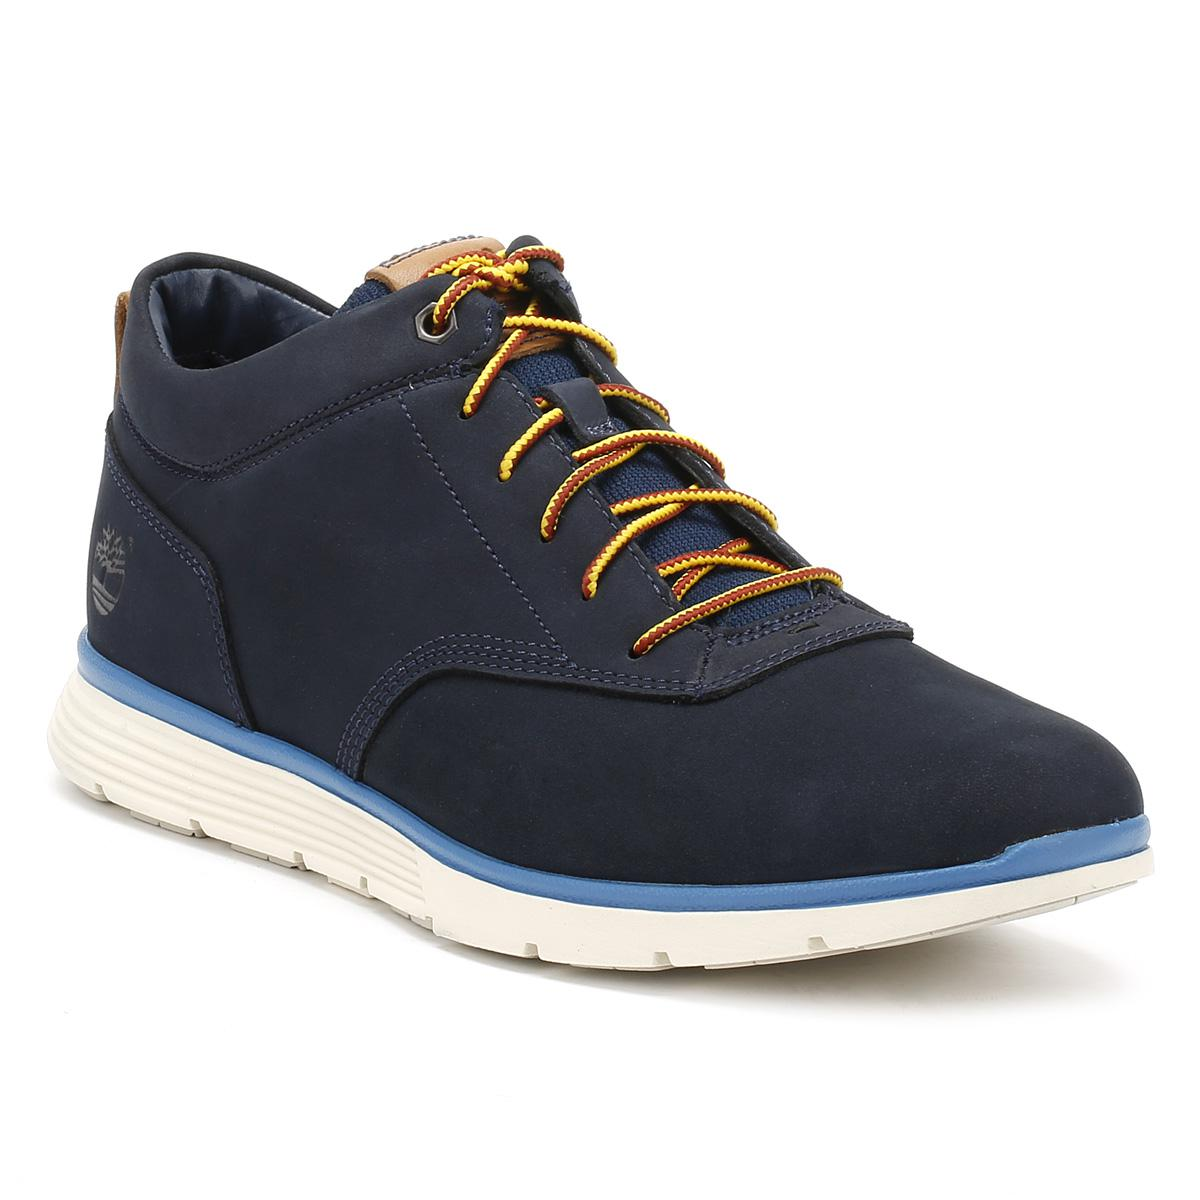 Lyst - Timberland Mens Black Iris Killington Half Cab Shoes in Black ... 96ea1b98bee